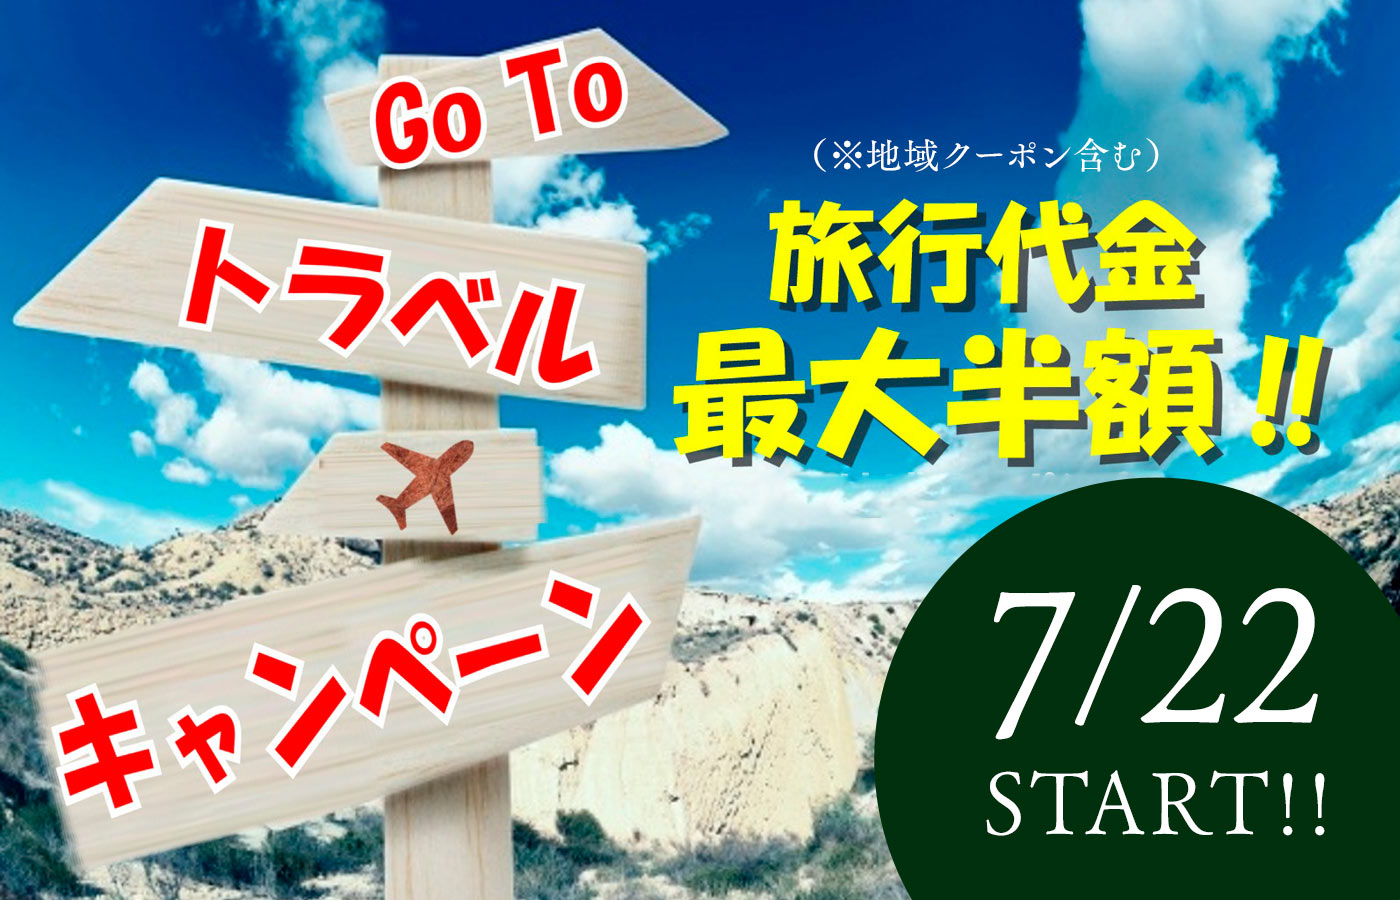 Go To トラベルキャンベーン!